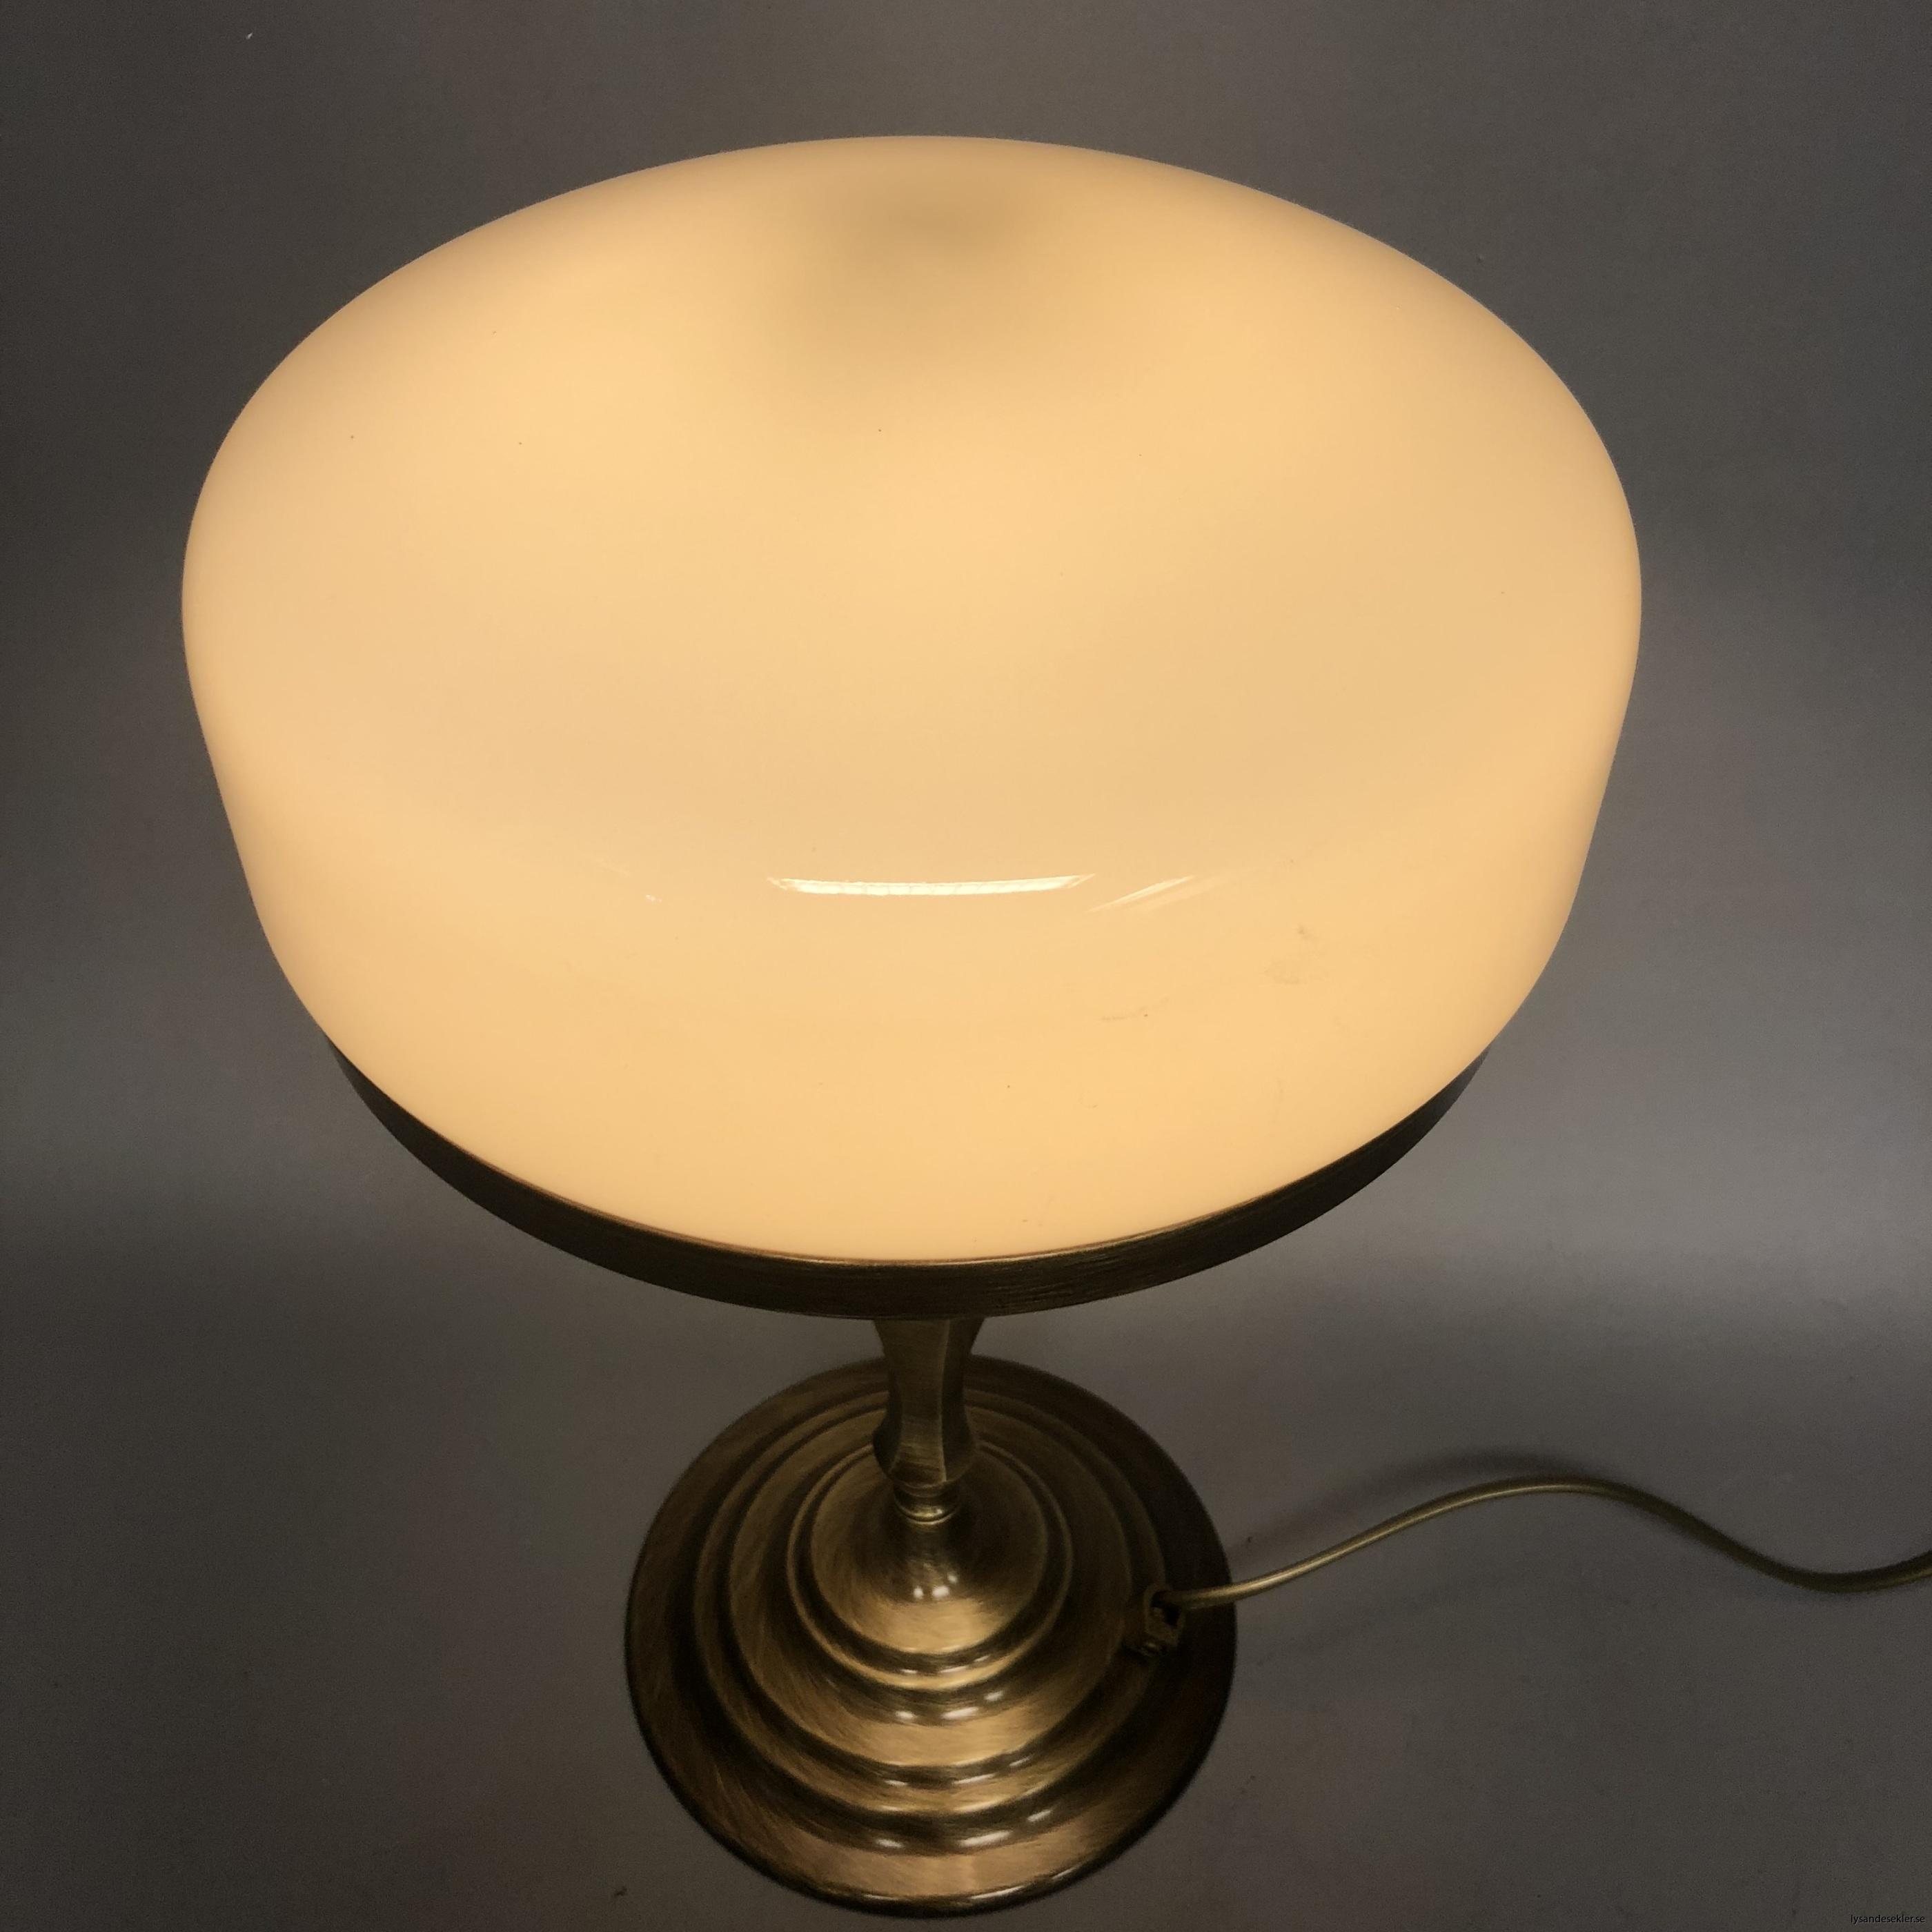 strindbergslampa strindbergslampor strindberg lampa skärm kupa strindbergsskärm strindbergskupa49